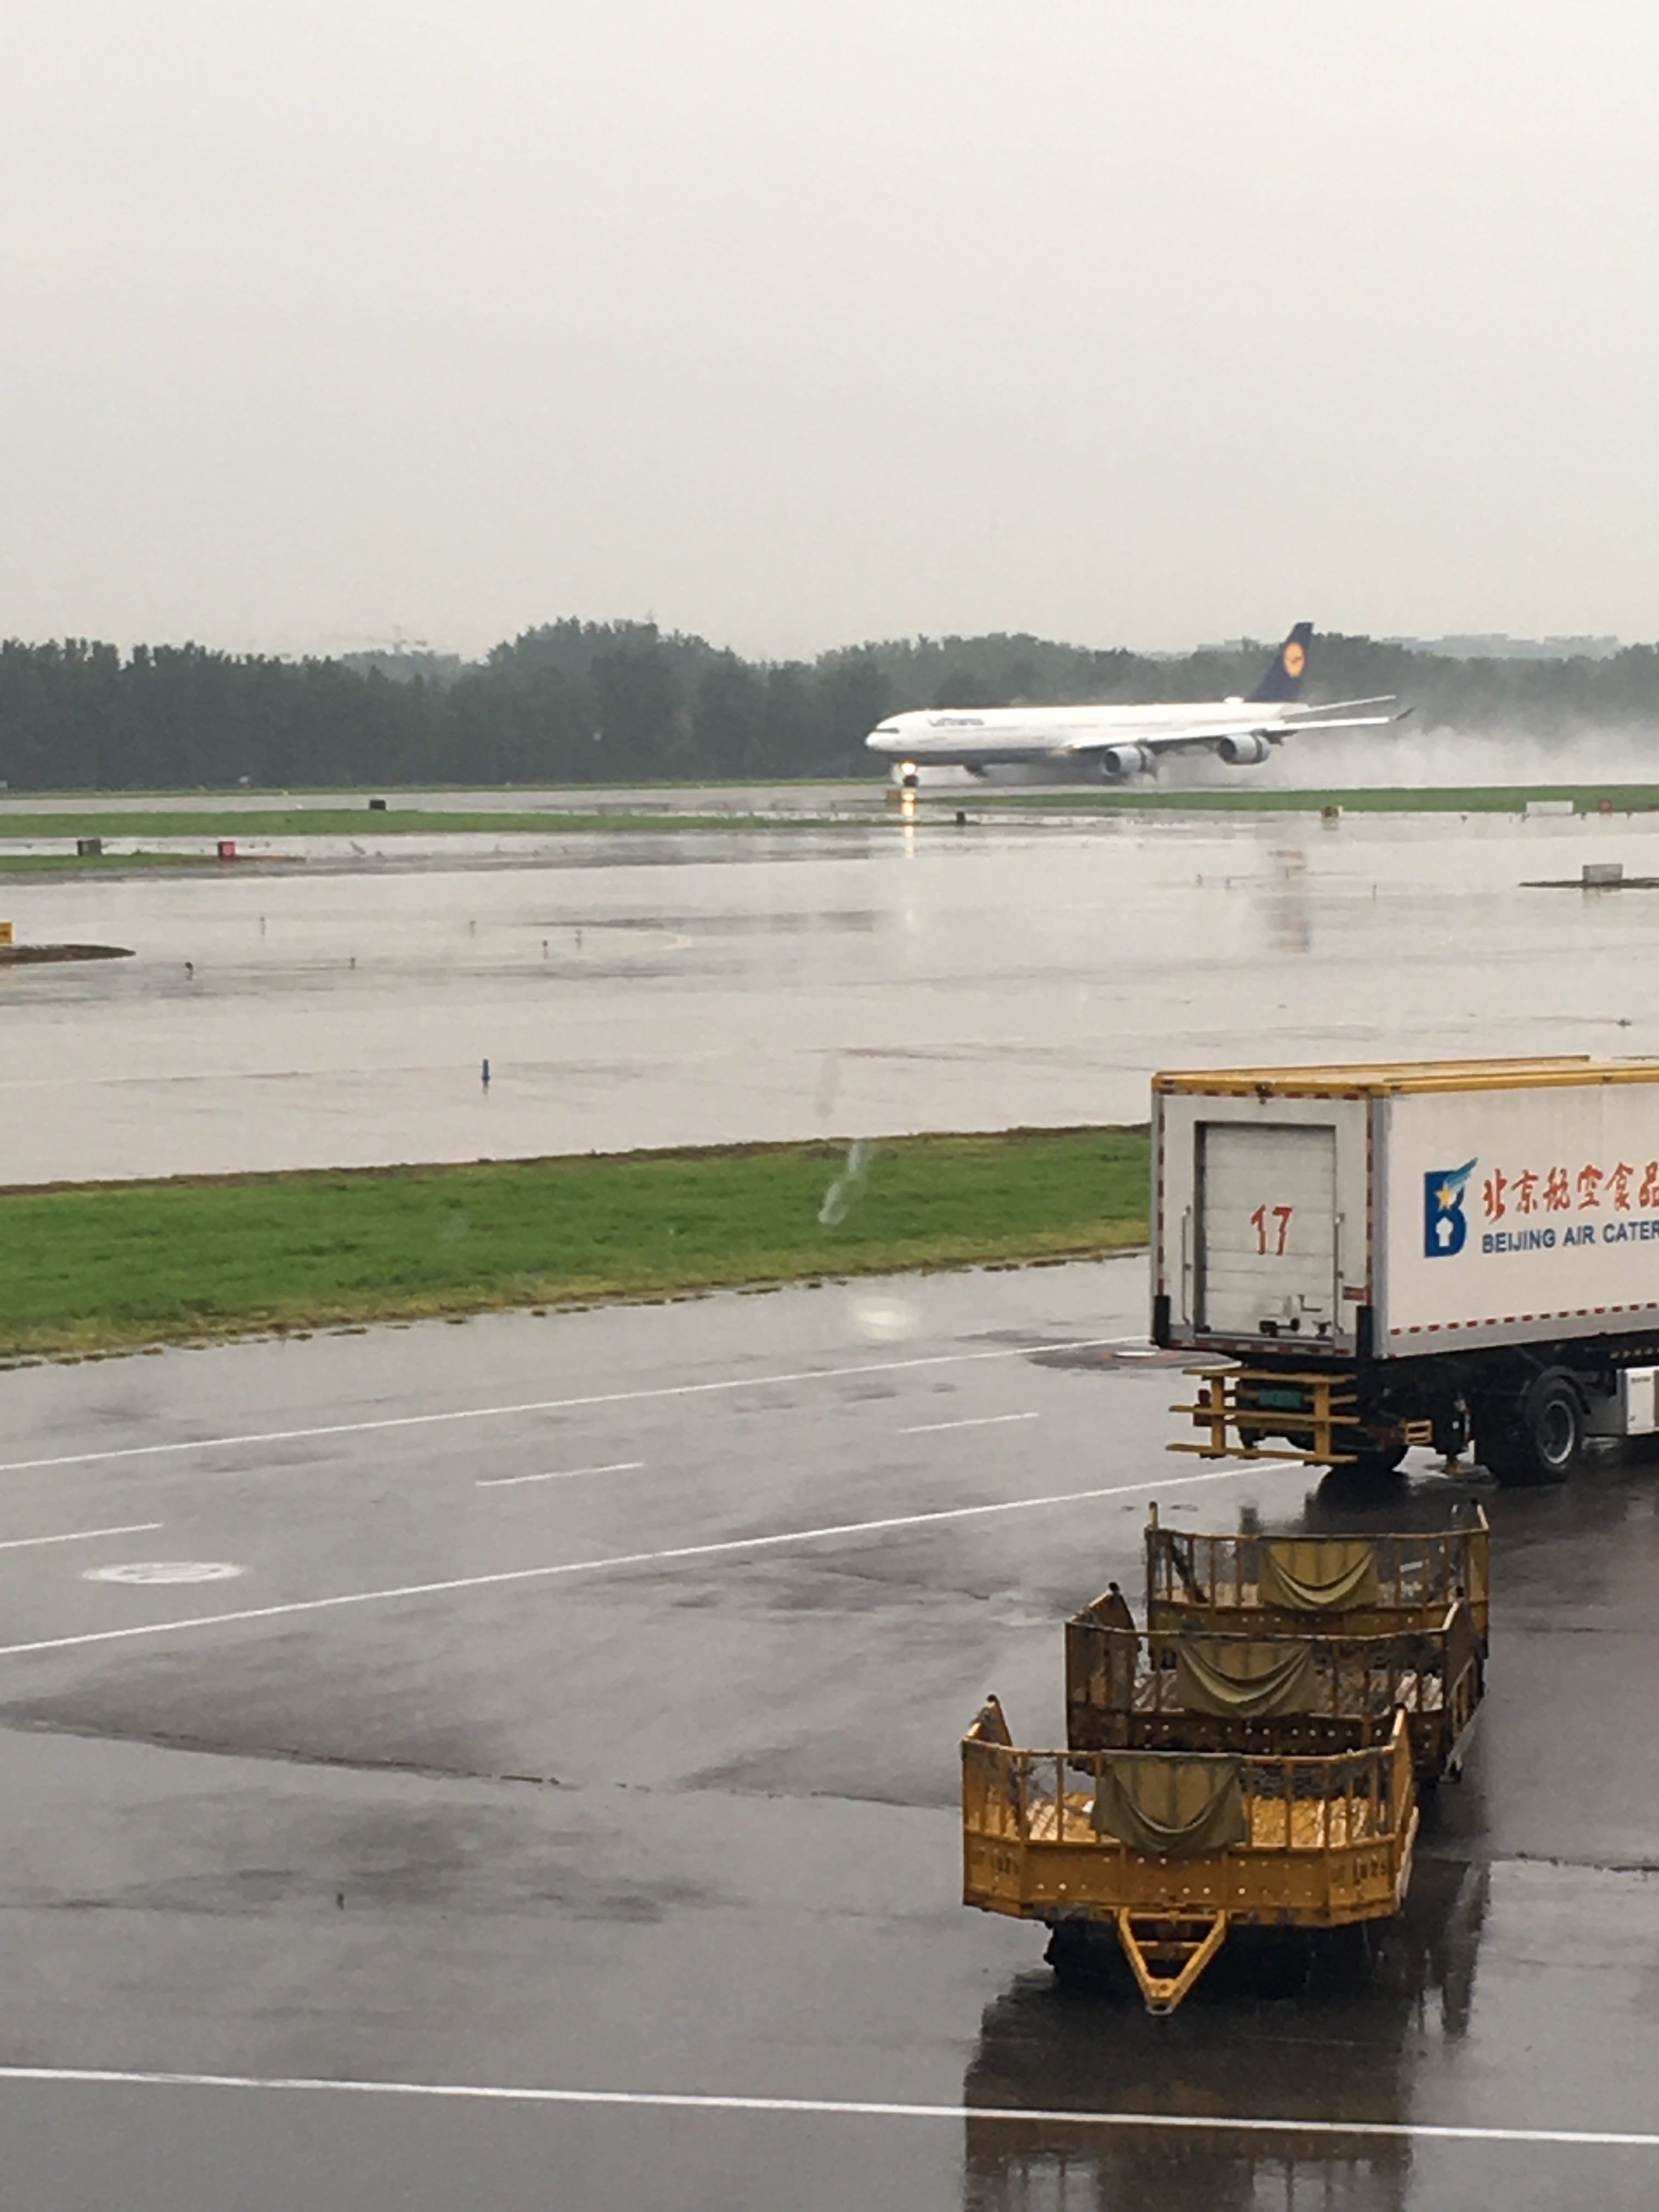 Re:[原创]~骚年飞行篇~补充半年前的香港之路,国航CA111 PEK-HKG,有幸坐到大擦第50架77W BOEING 777-300ER B-2039 中国北京首都国际机场 中国北京首都国际机场